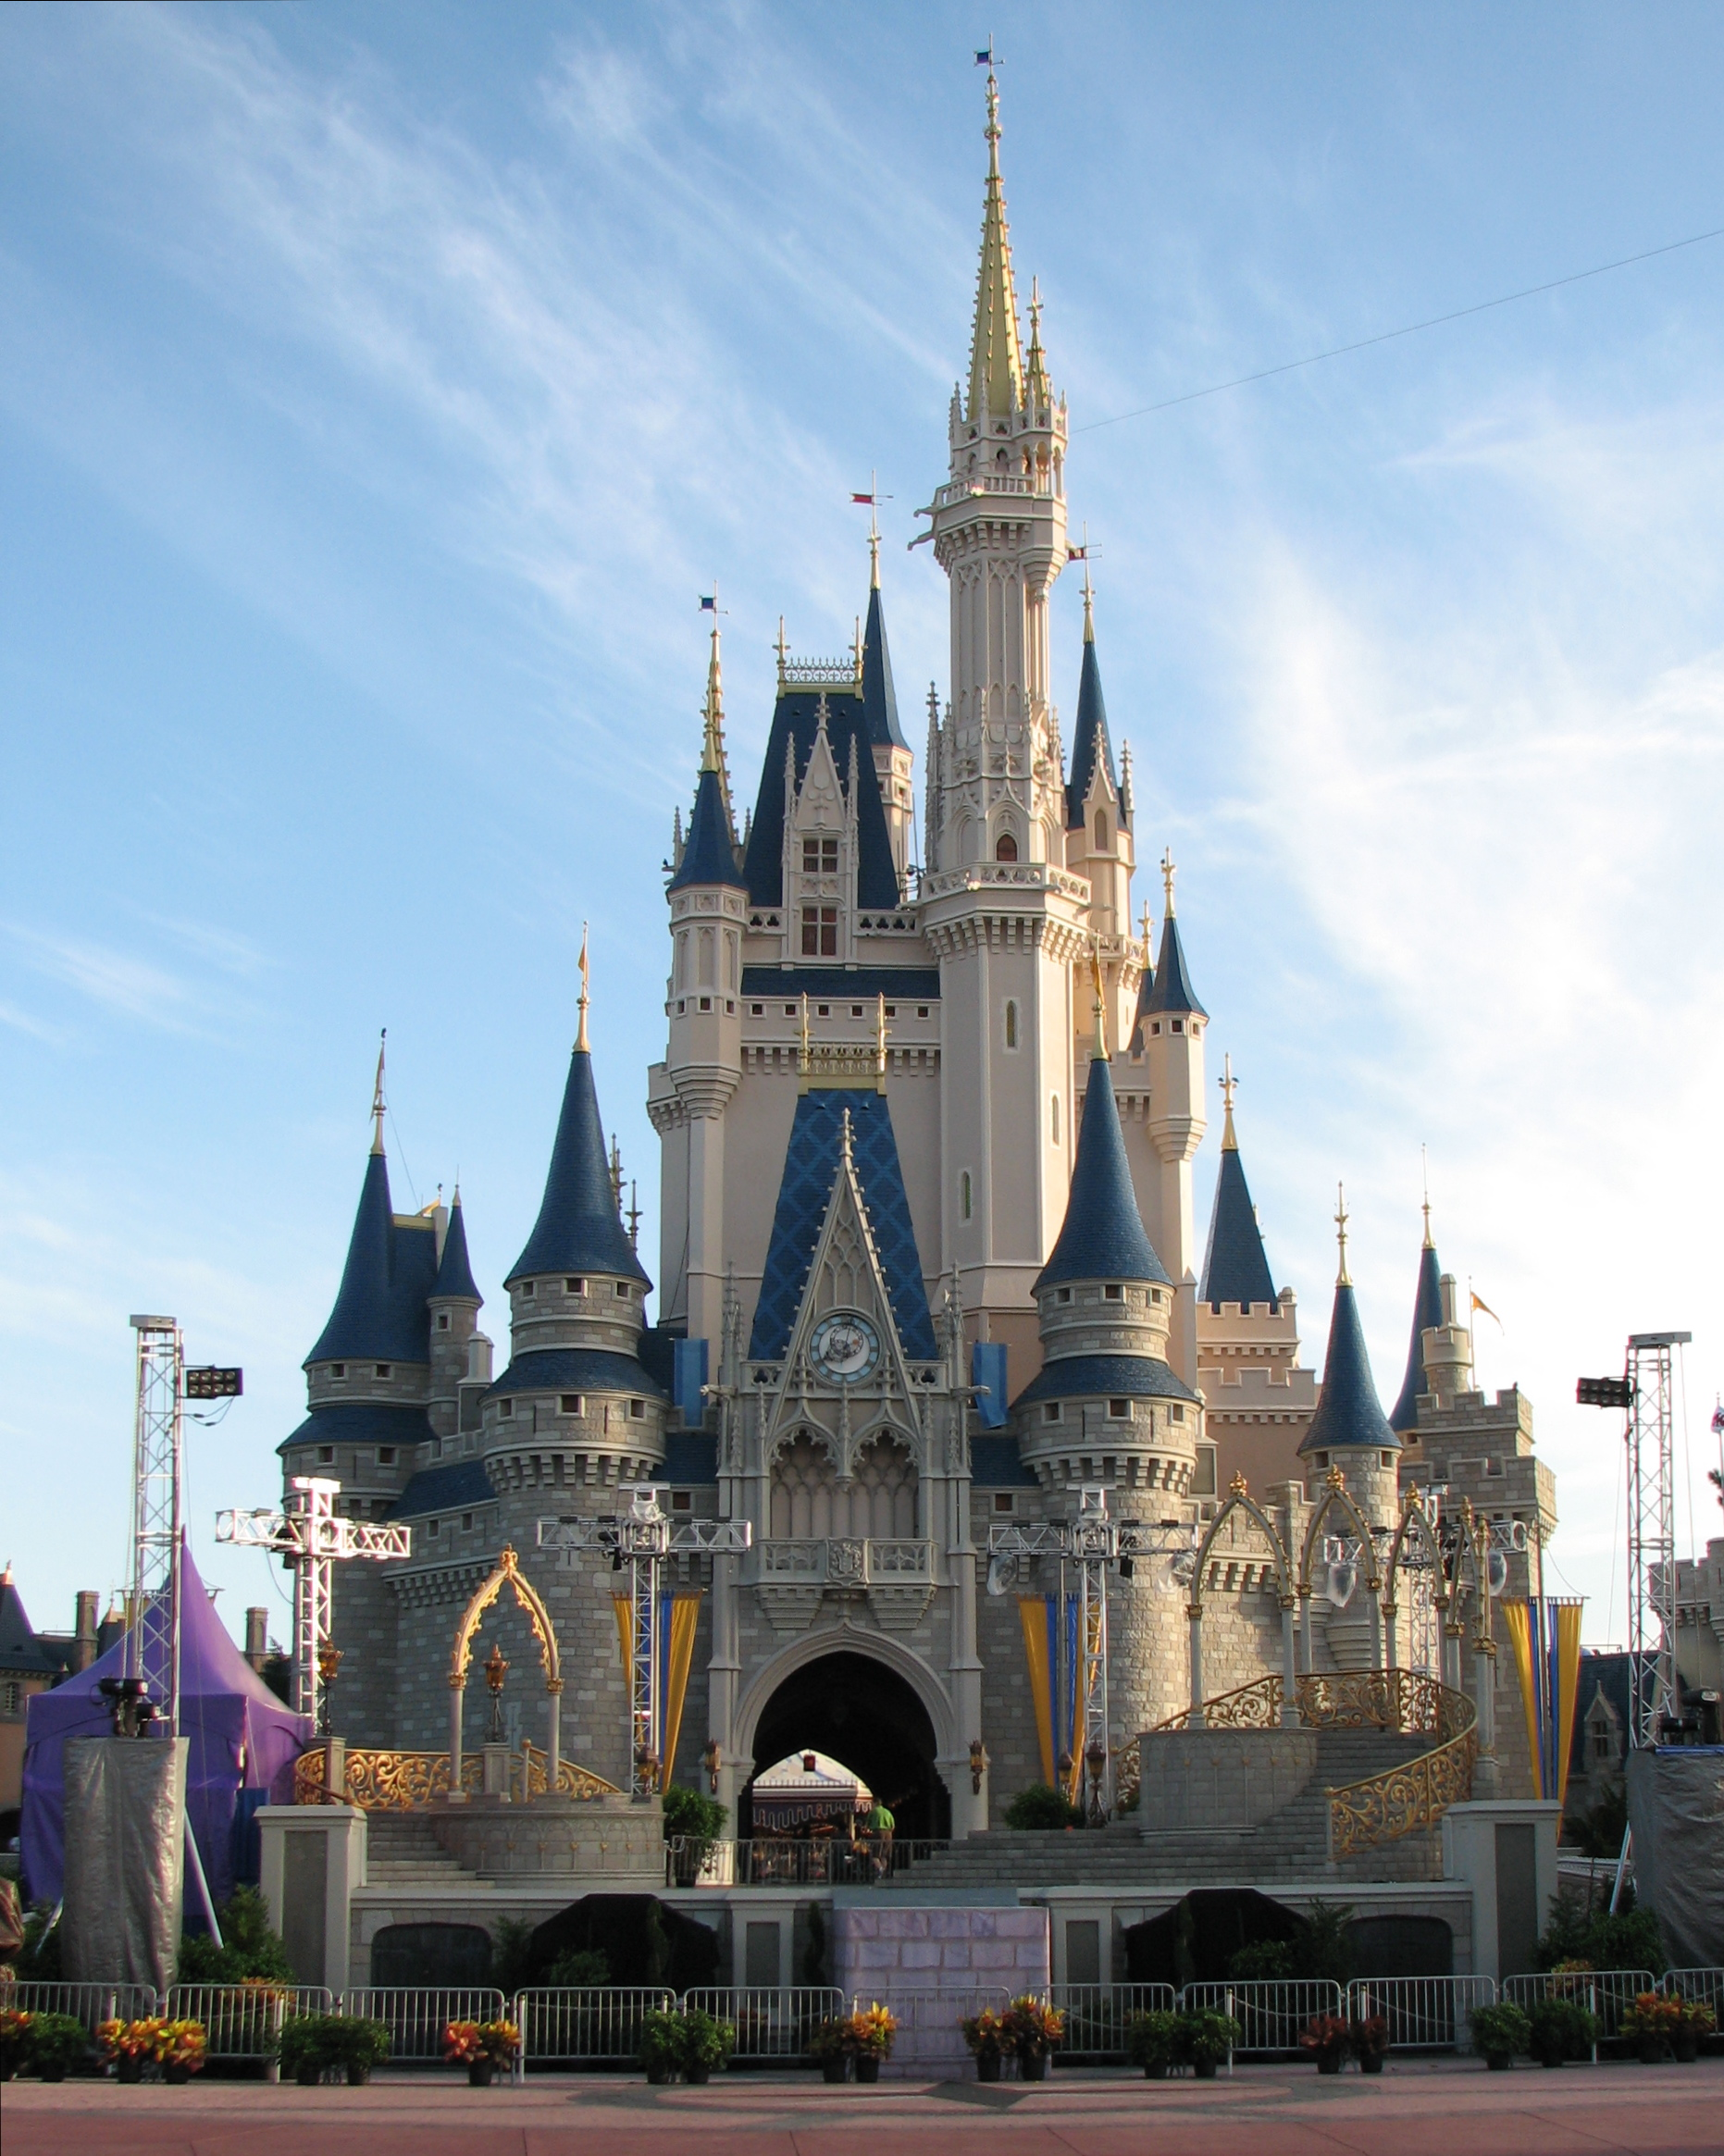 Cinderella castle disney castle disneyland creative clipart wikiclipart